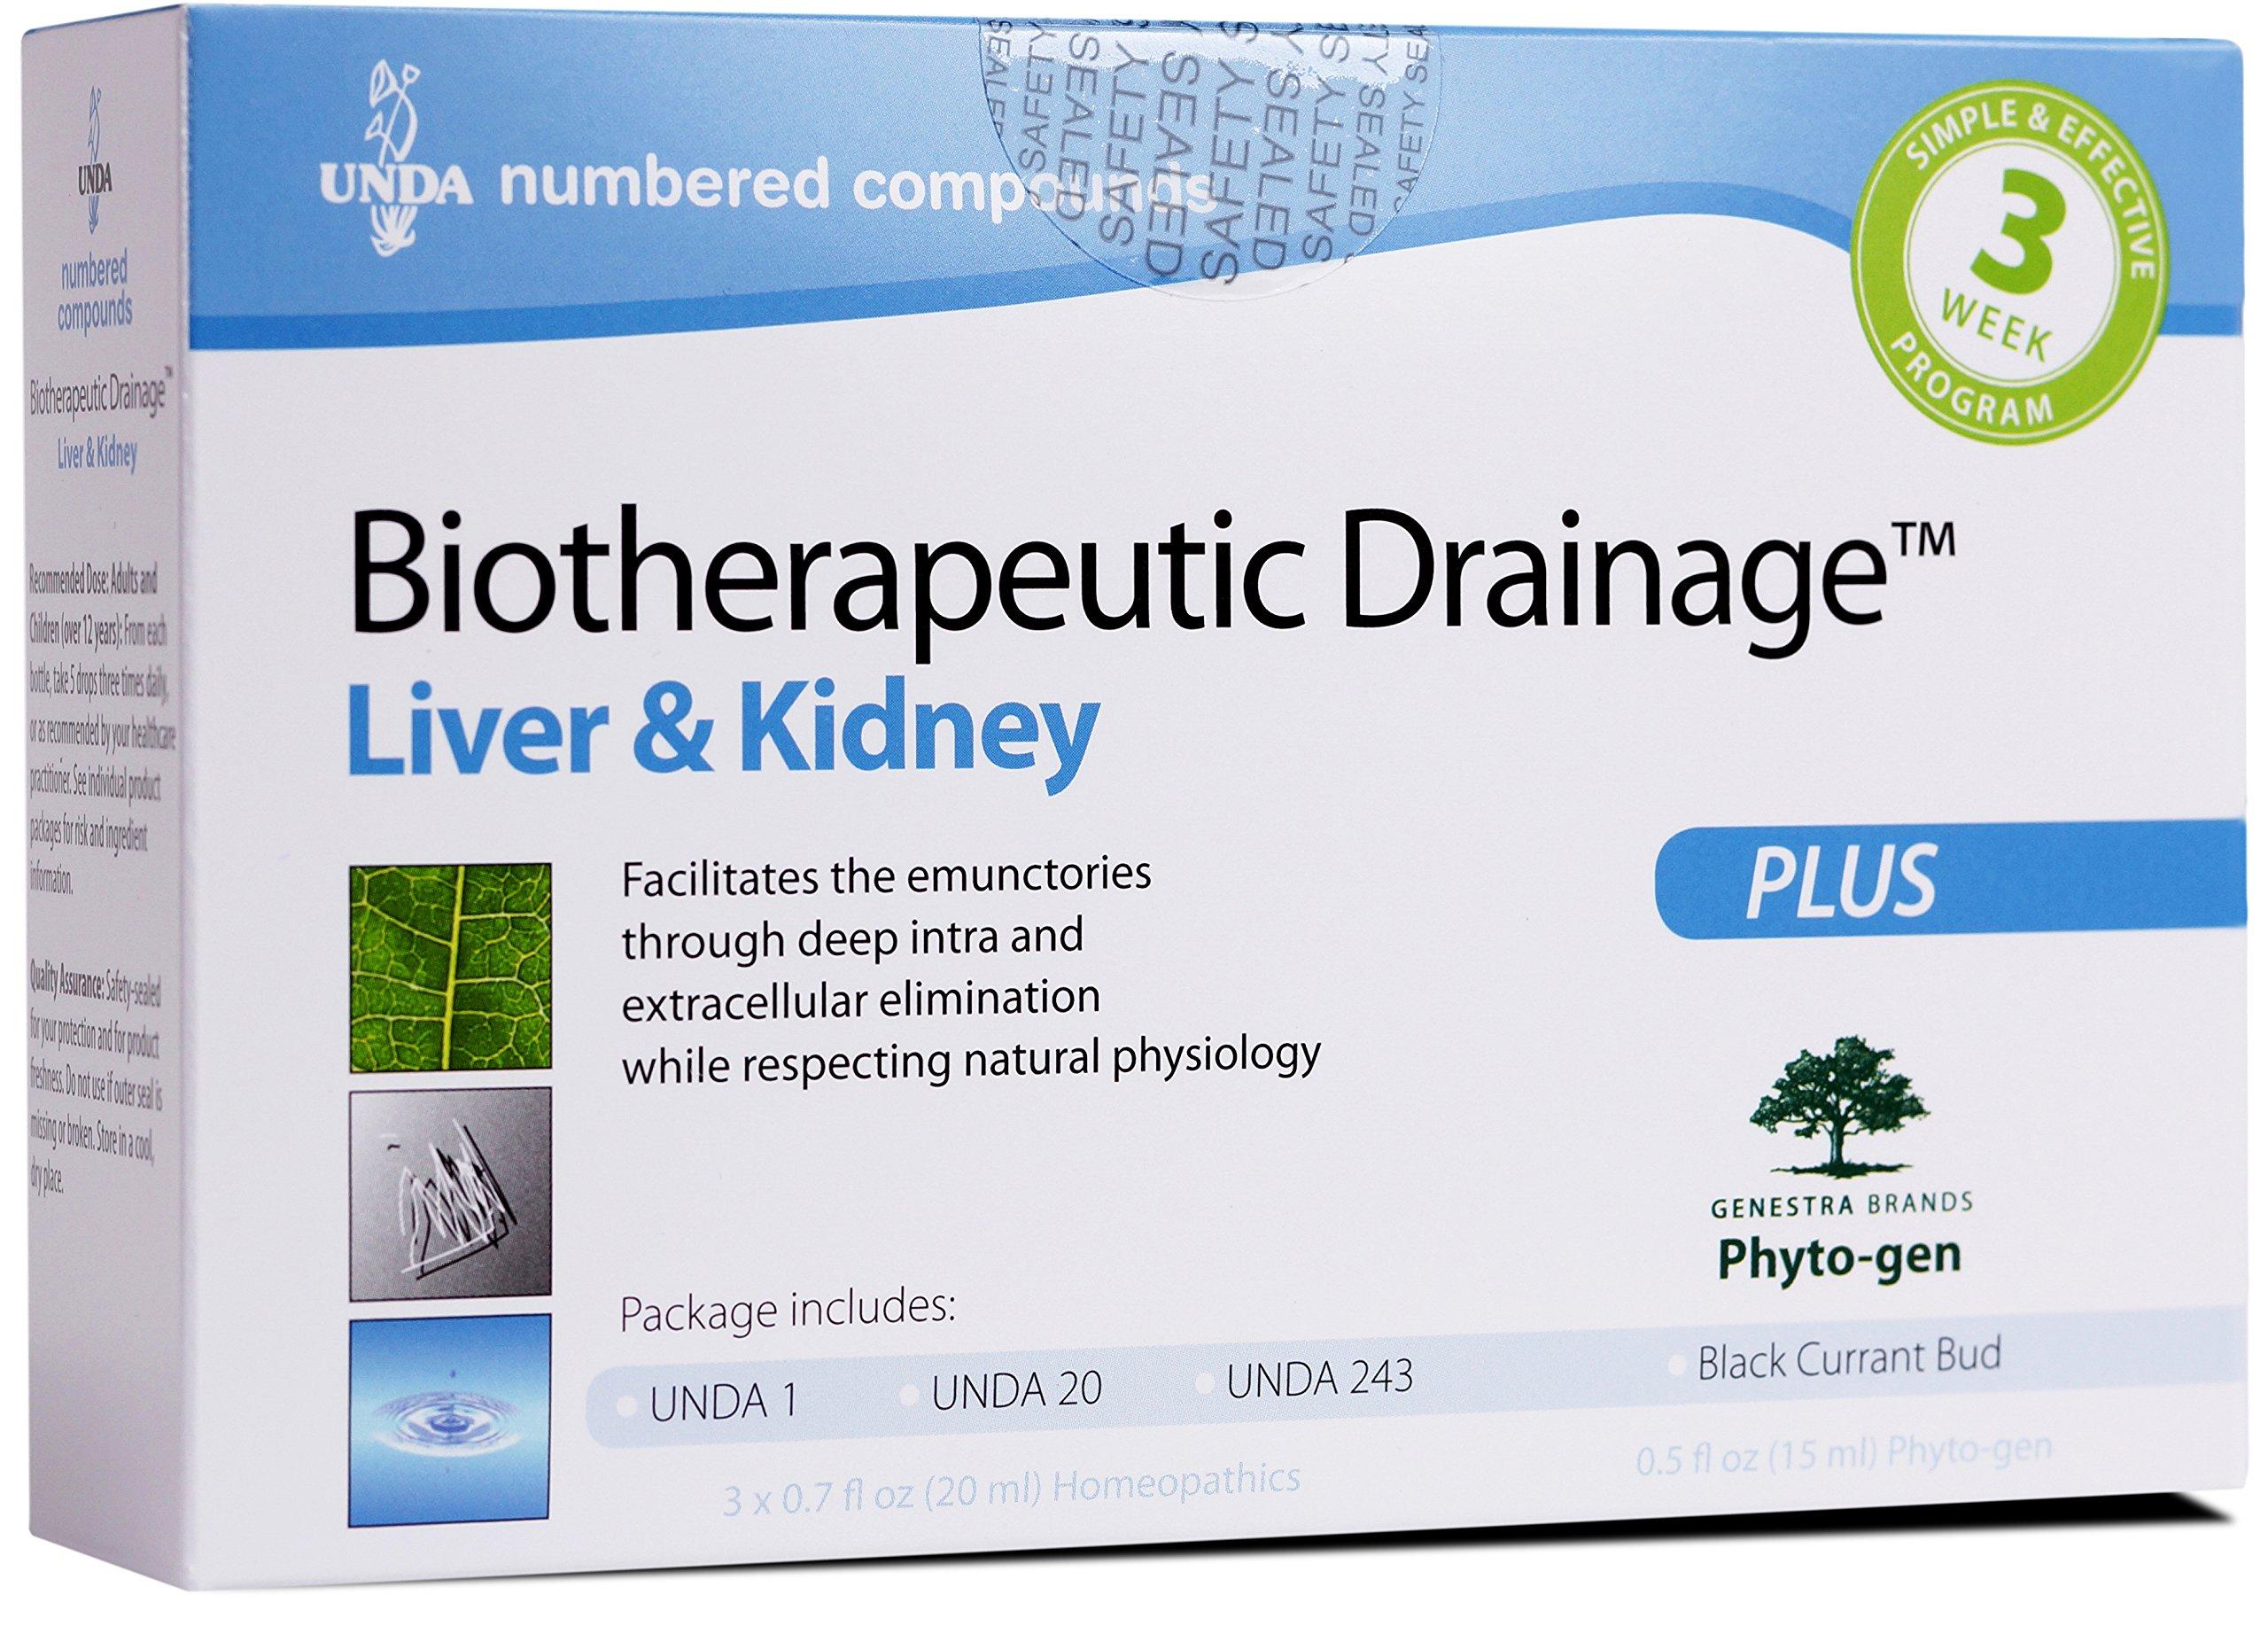 UNDA - Biotherapeutic Drainage - UNDA 1, UNDA 20, UNDA 243 & Black Currant Bud to Support Liver & Kidney*^ - 1 Package by UNDA